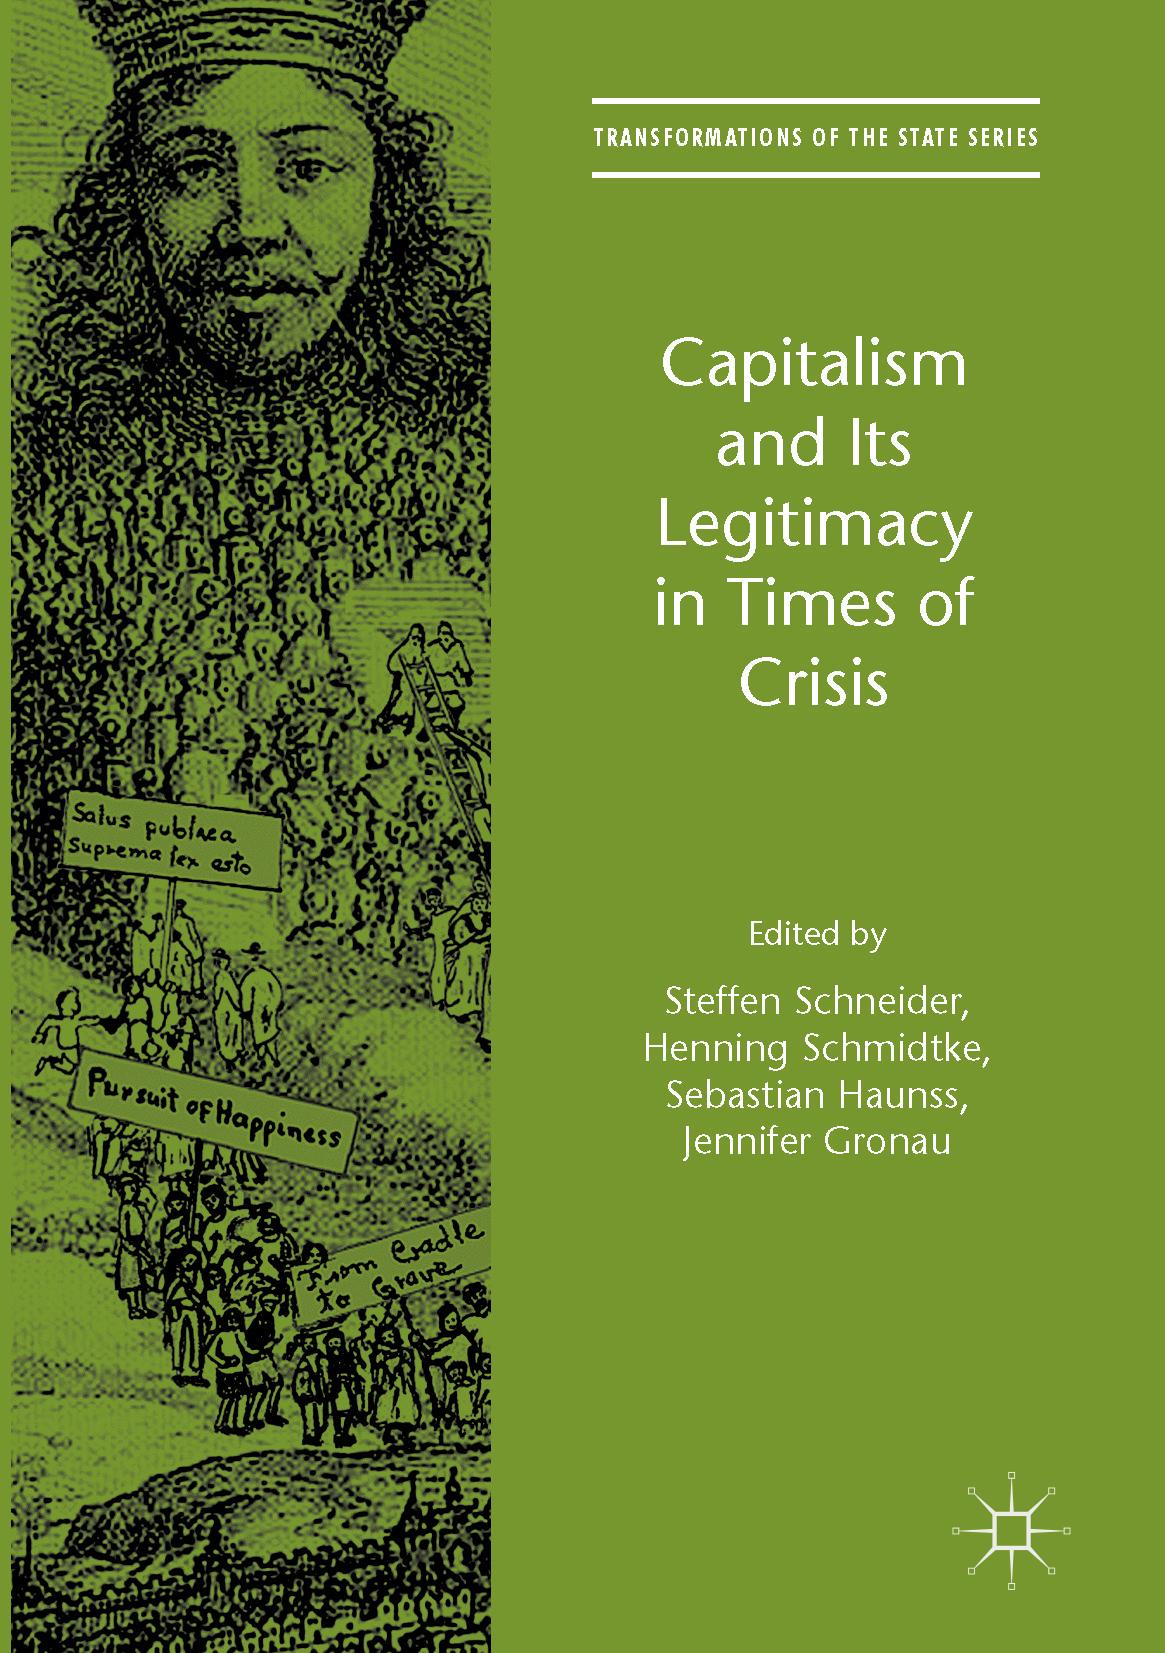 Gronau, Jennifer - Capitalism and Its Legitimacy in Times of Crisis, ebook